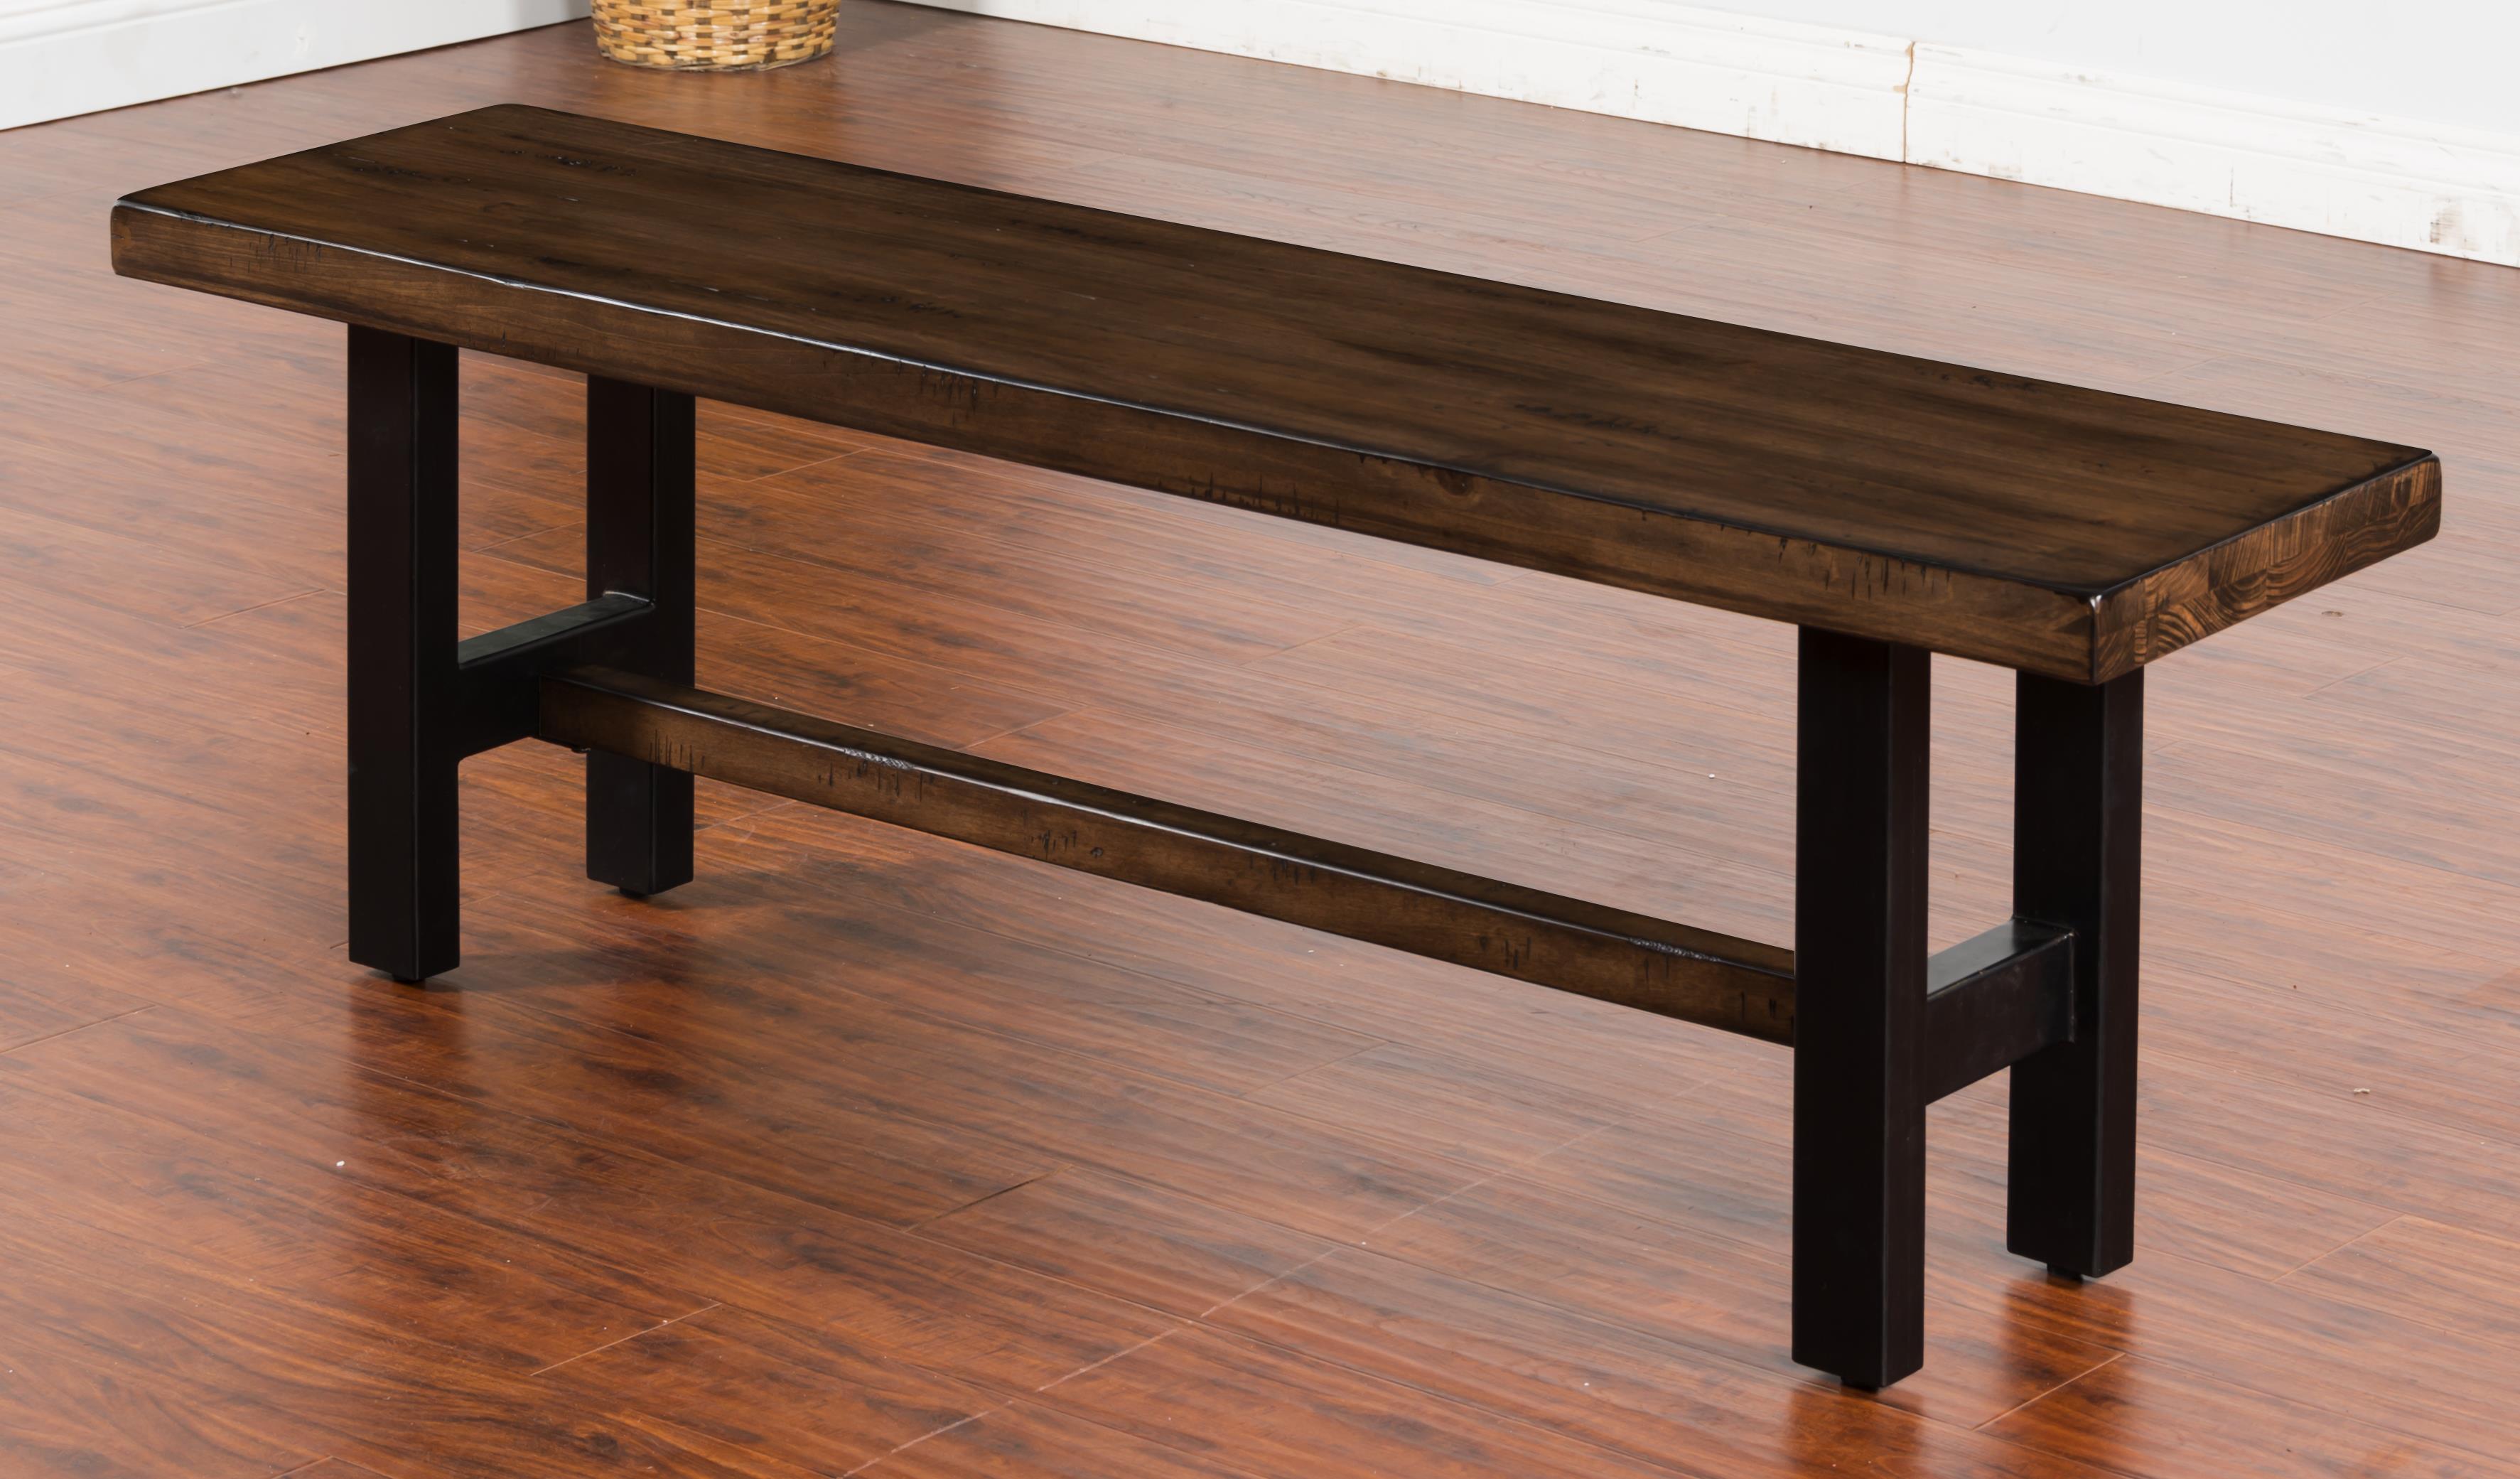 Morris Home Furnishings Wellman Wellman Dining Bench - Item Number: 382833296